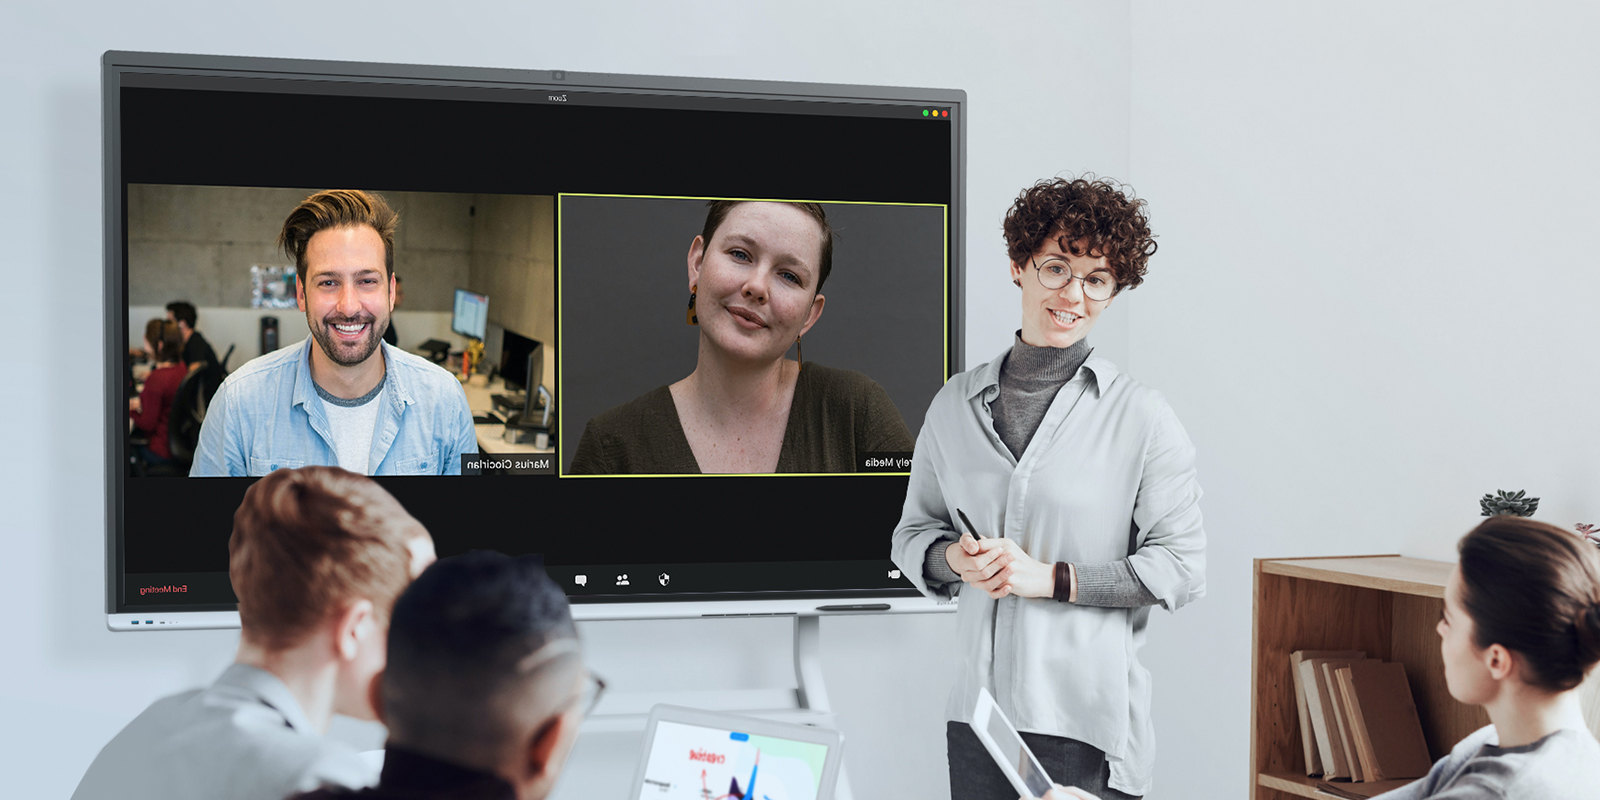 la digitalisation des espaces de travail avec l'écran interactif